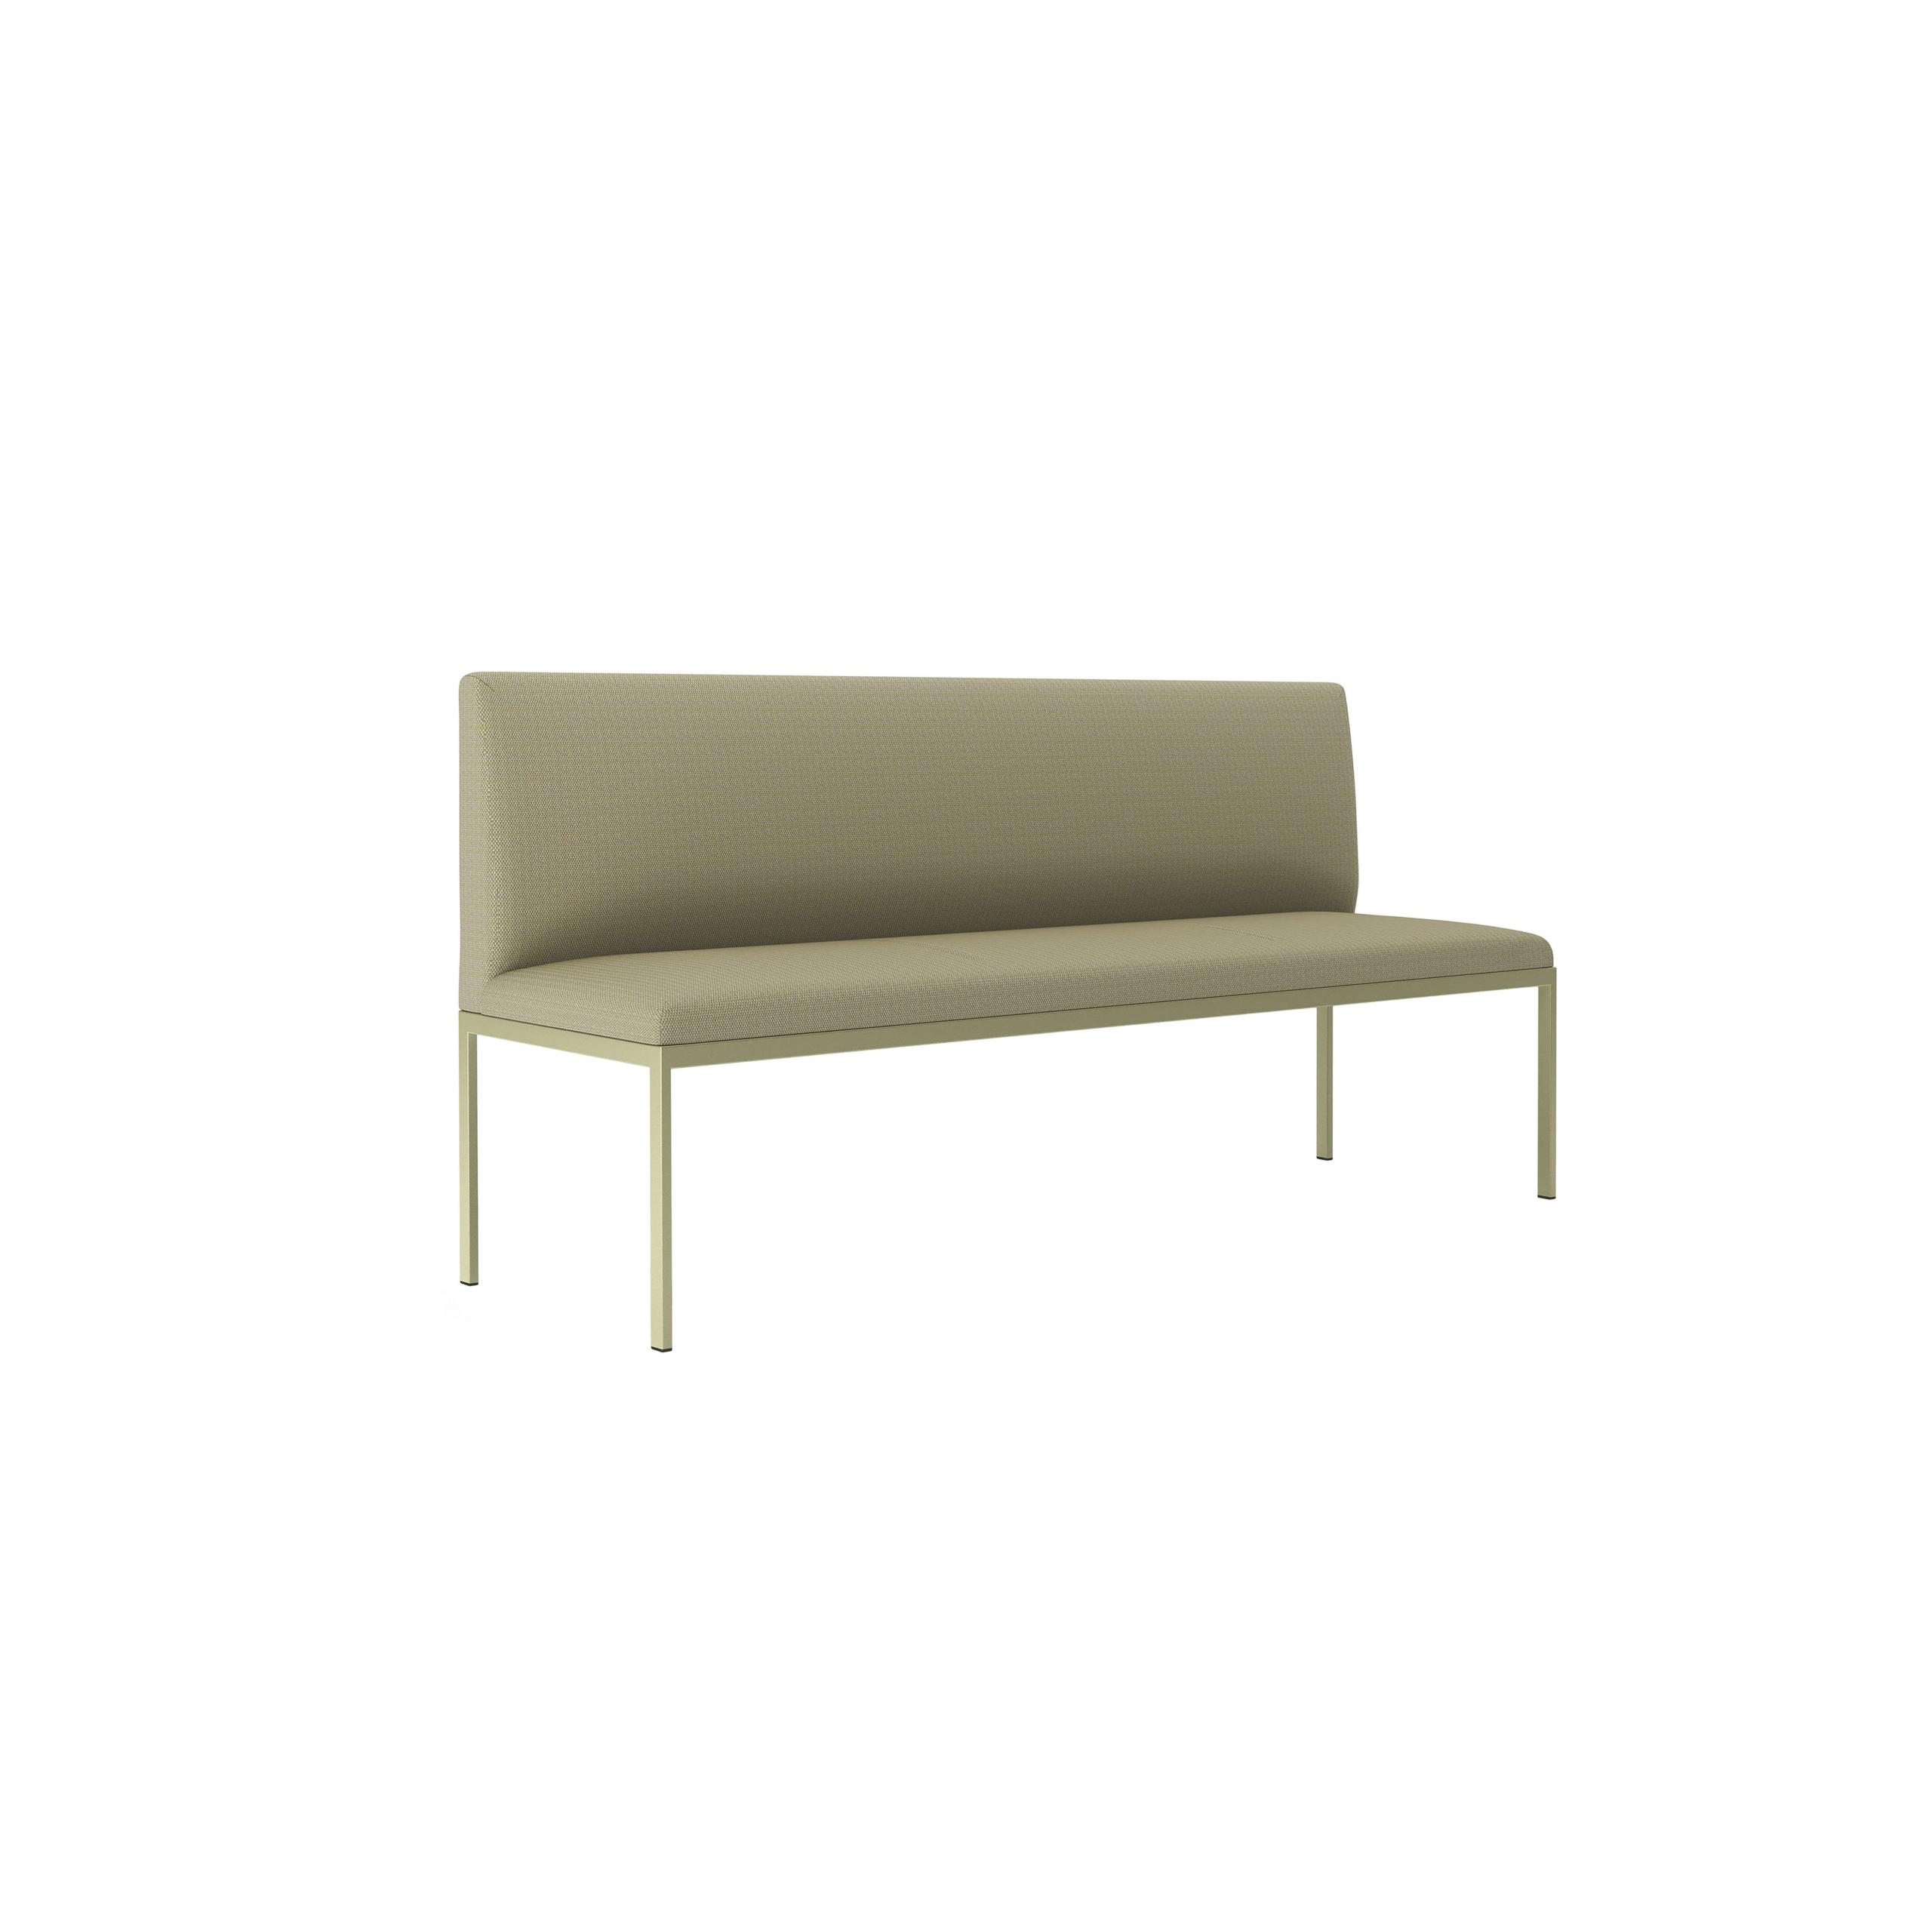 Create Seating Soffa produktbild 4